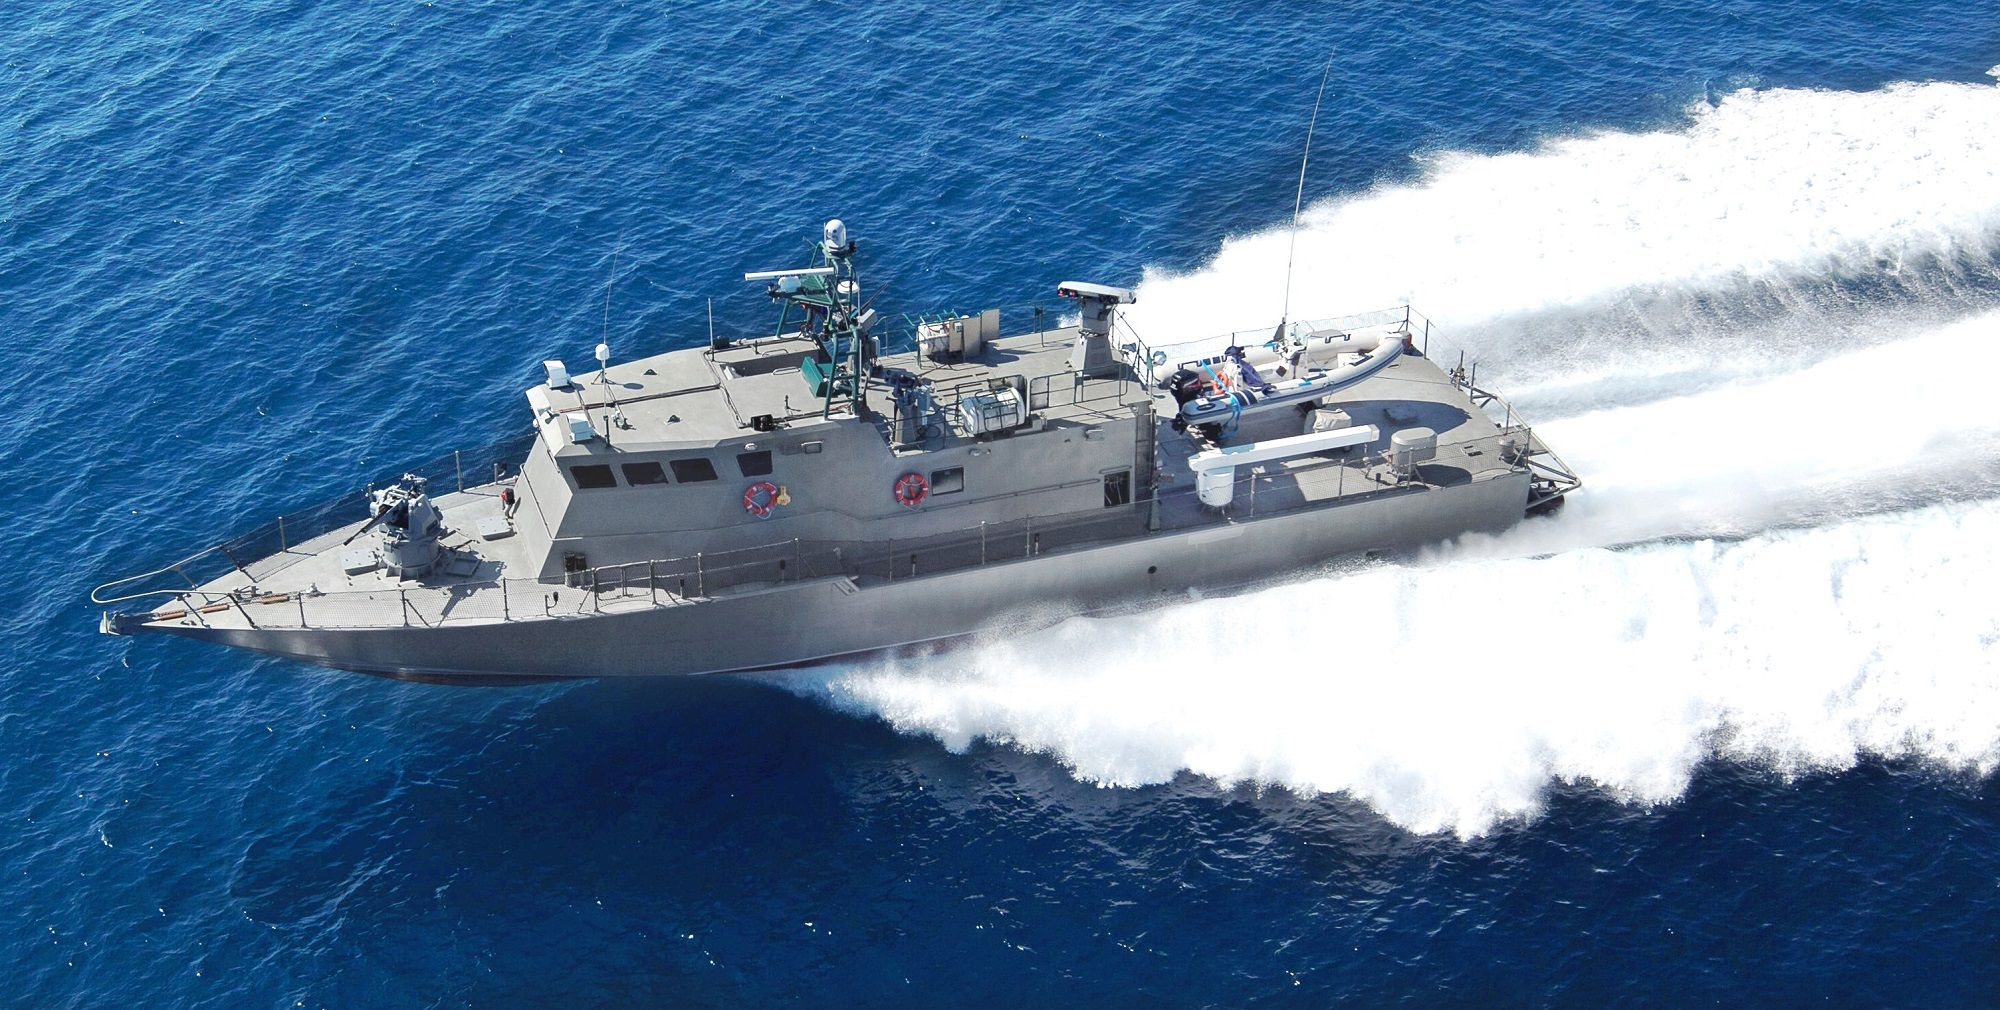 A SHALDAG MK. V-class vessel in navigation. These fast patrol craft are one of Israel Shipyards' best sellers. (Photo: Israel Shipyard)